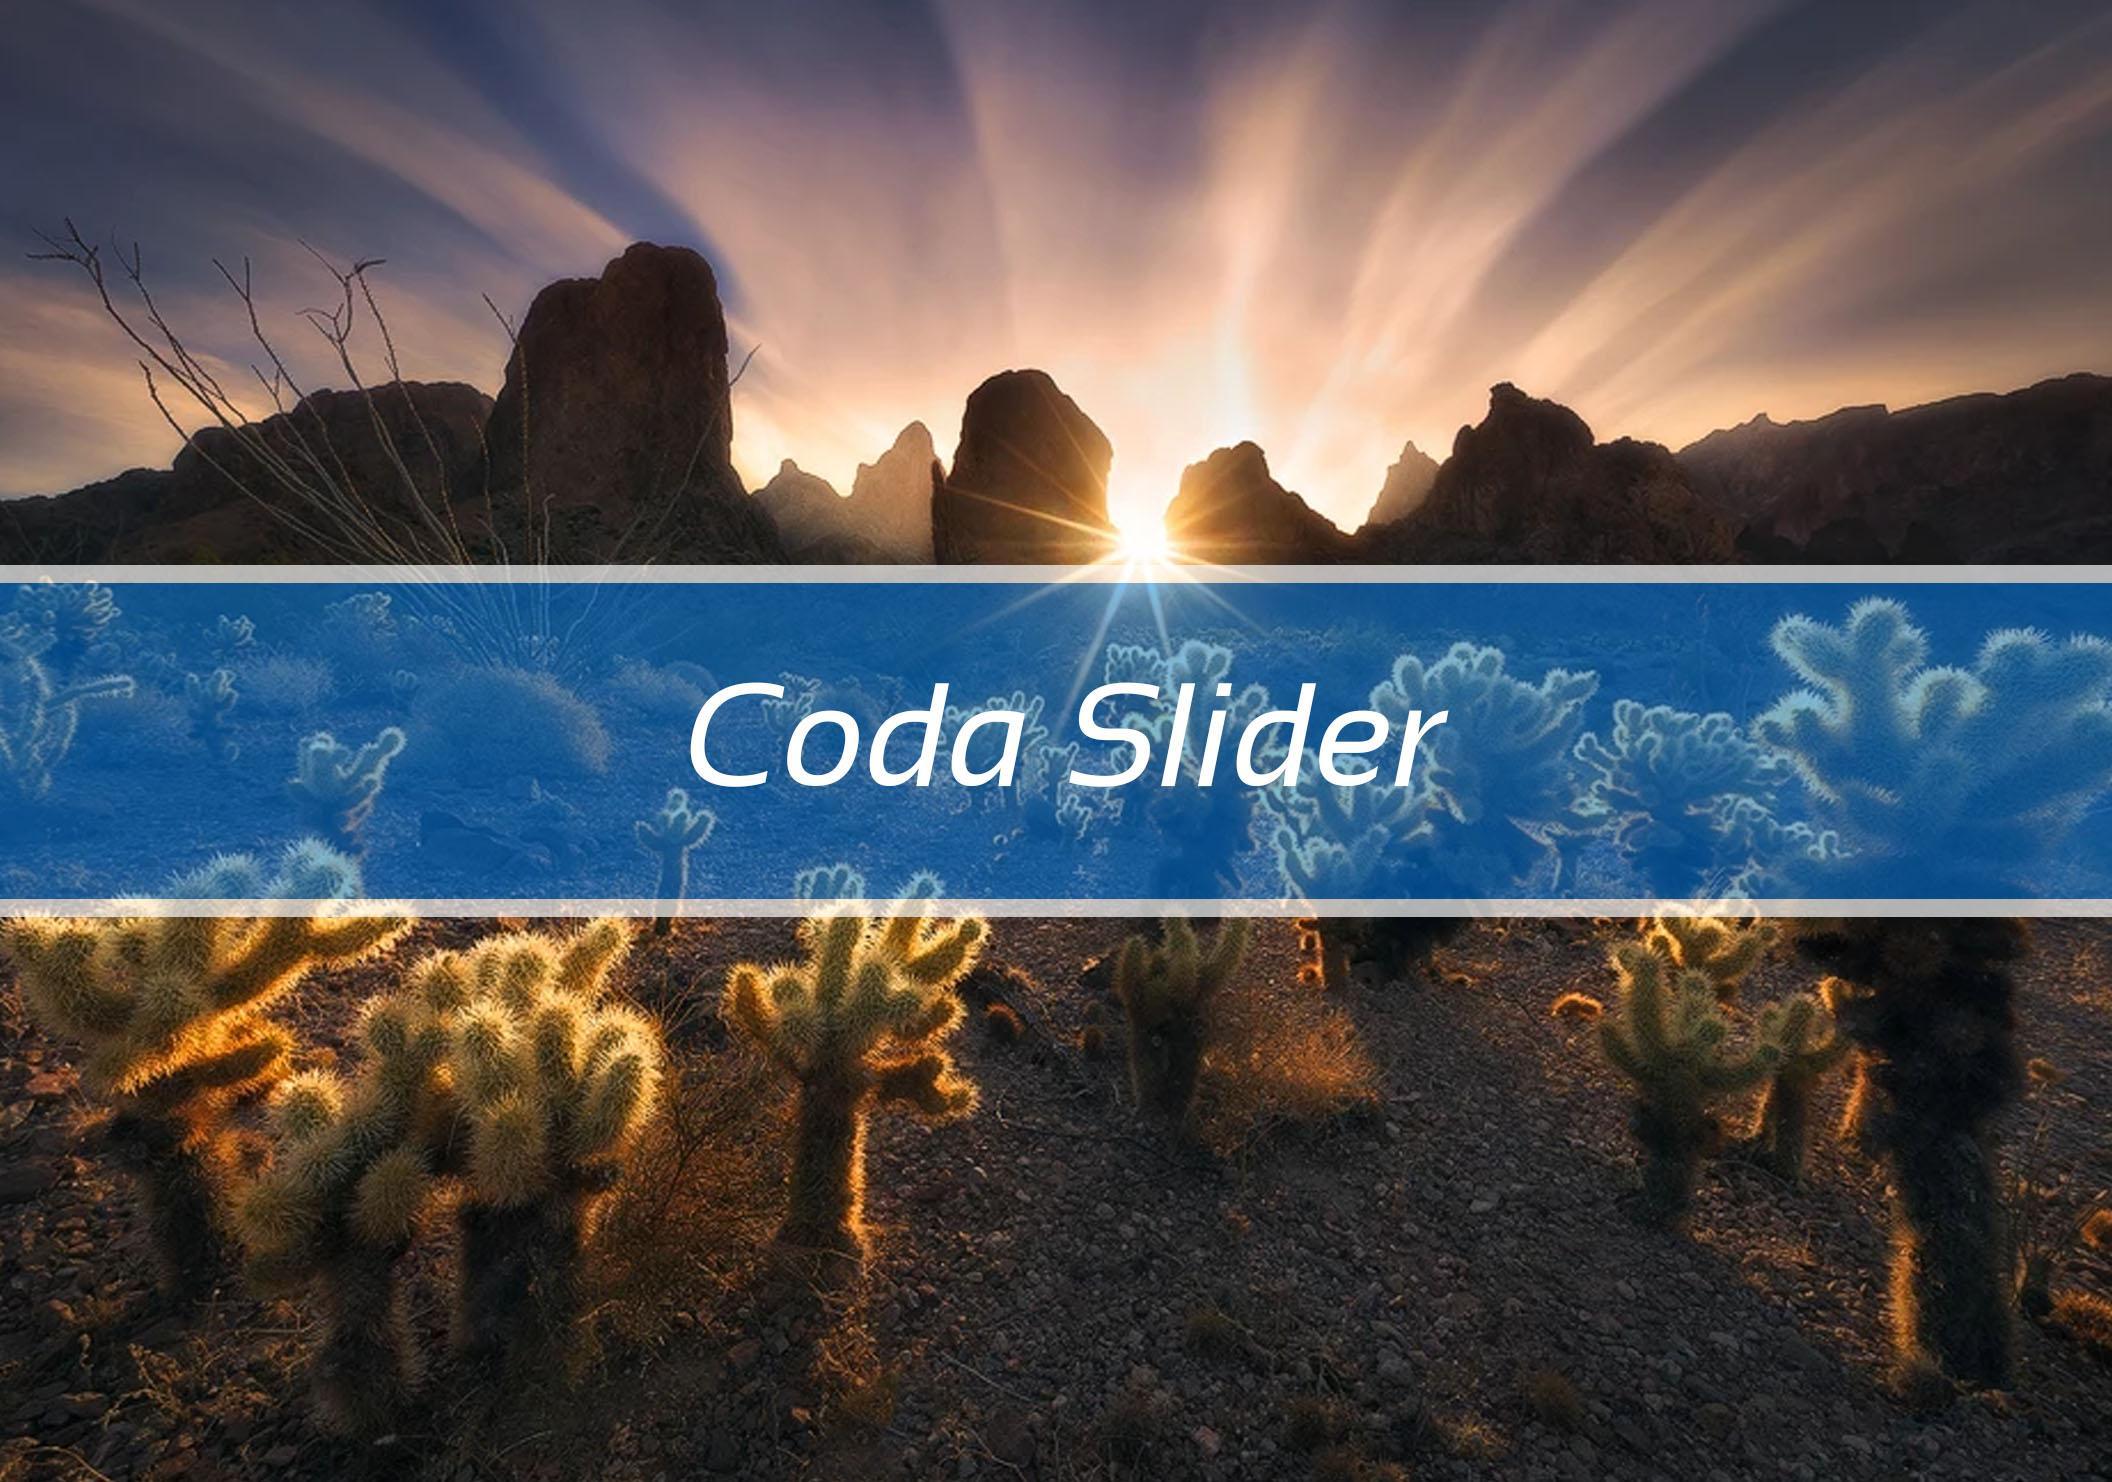 Coda Slider